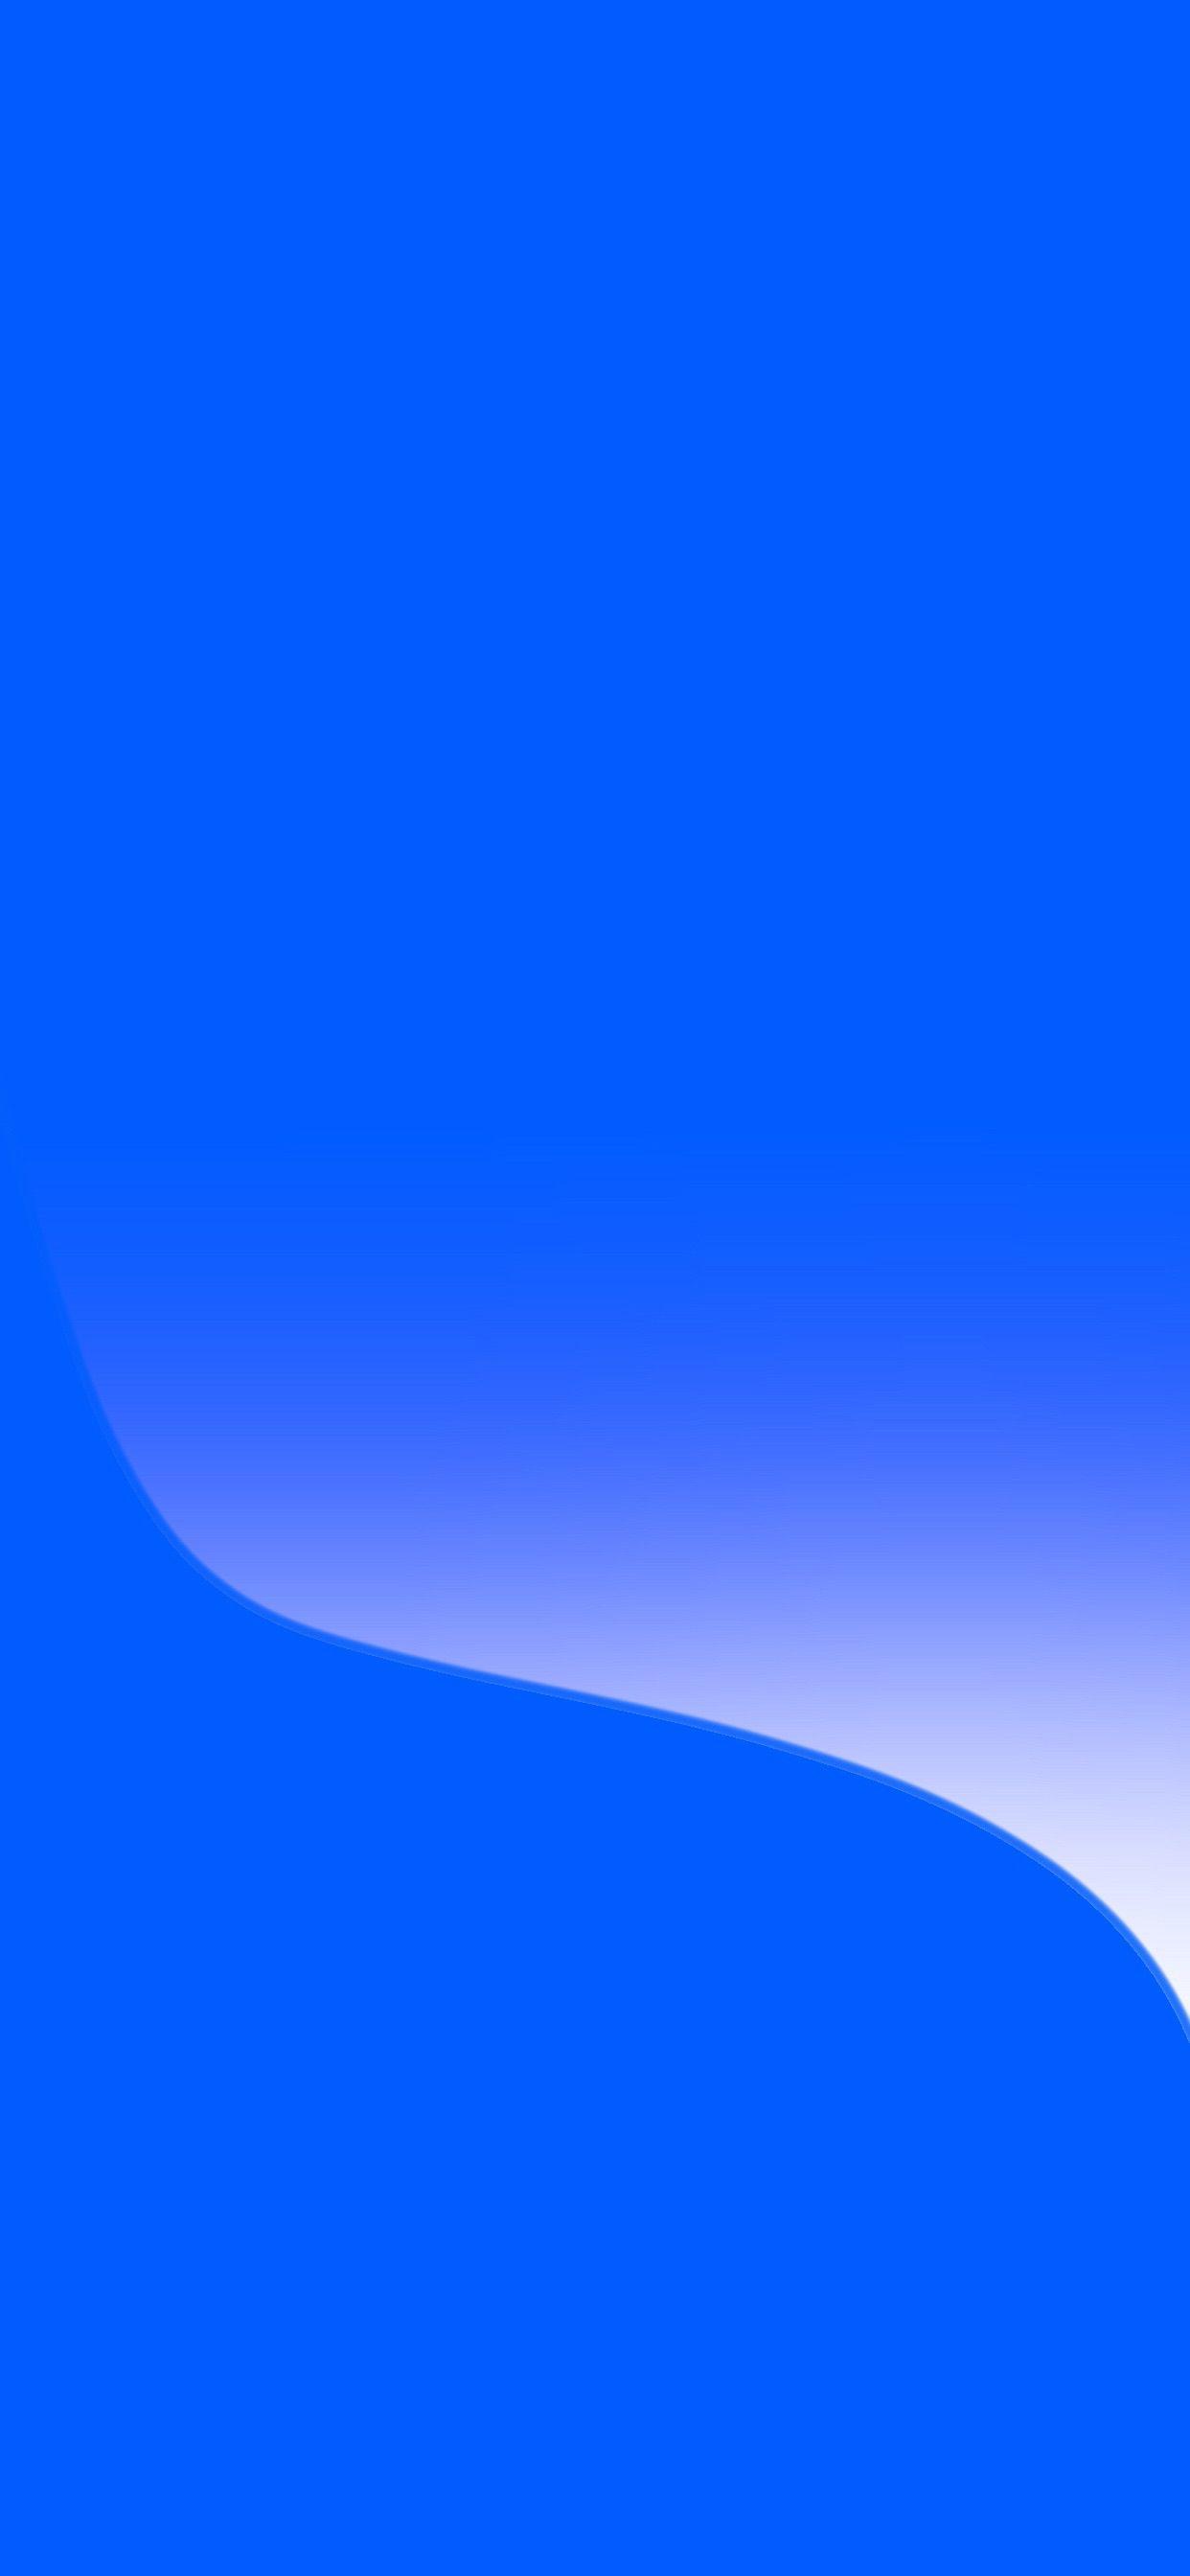 Wallpaper Designed By C Hotspot4u Iphone Iphonewallpaper Iphonex